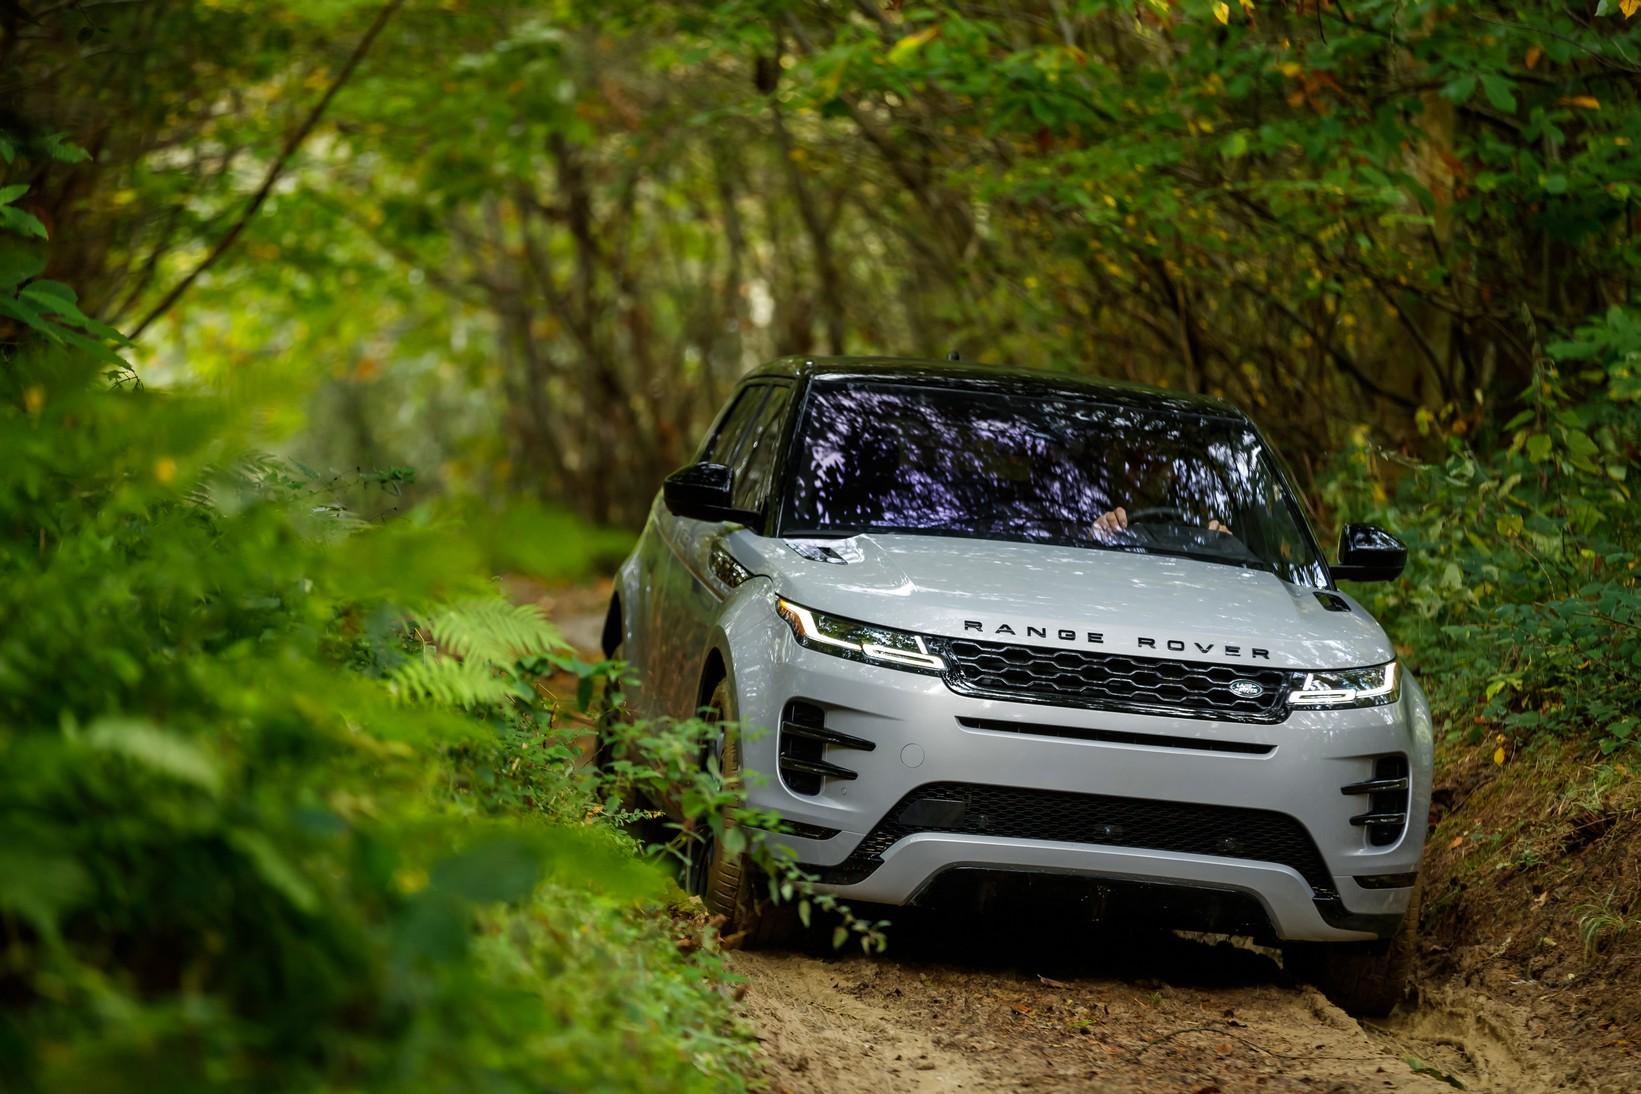 Land Rover Range Rover Evoque 2.0 D180 SE 5dr Auto Diesel Automatic Hatchback (2019)